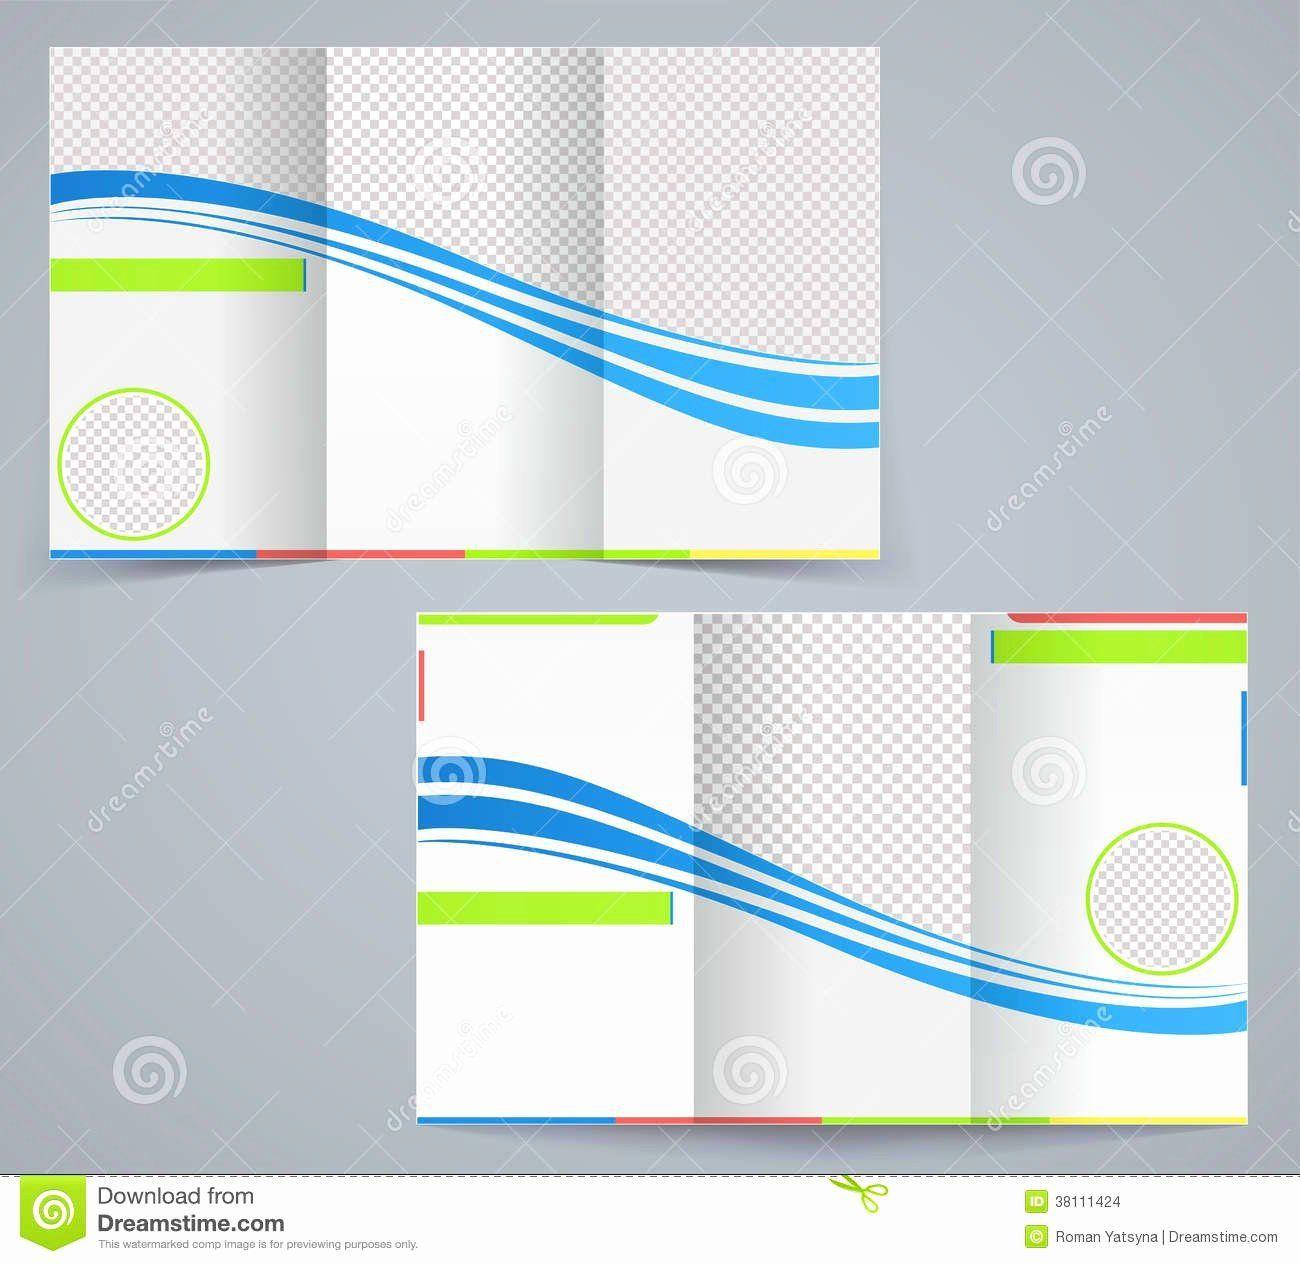 000 Stirring Tri Fold Brochure Template Word Design  2010 2007 FreeFull